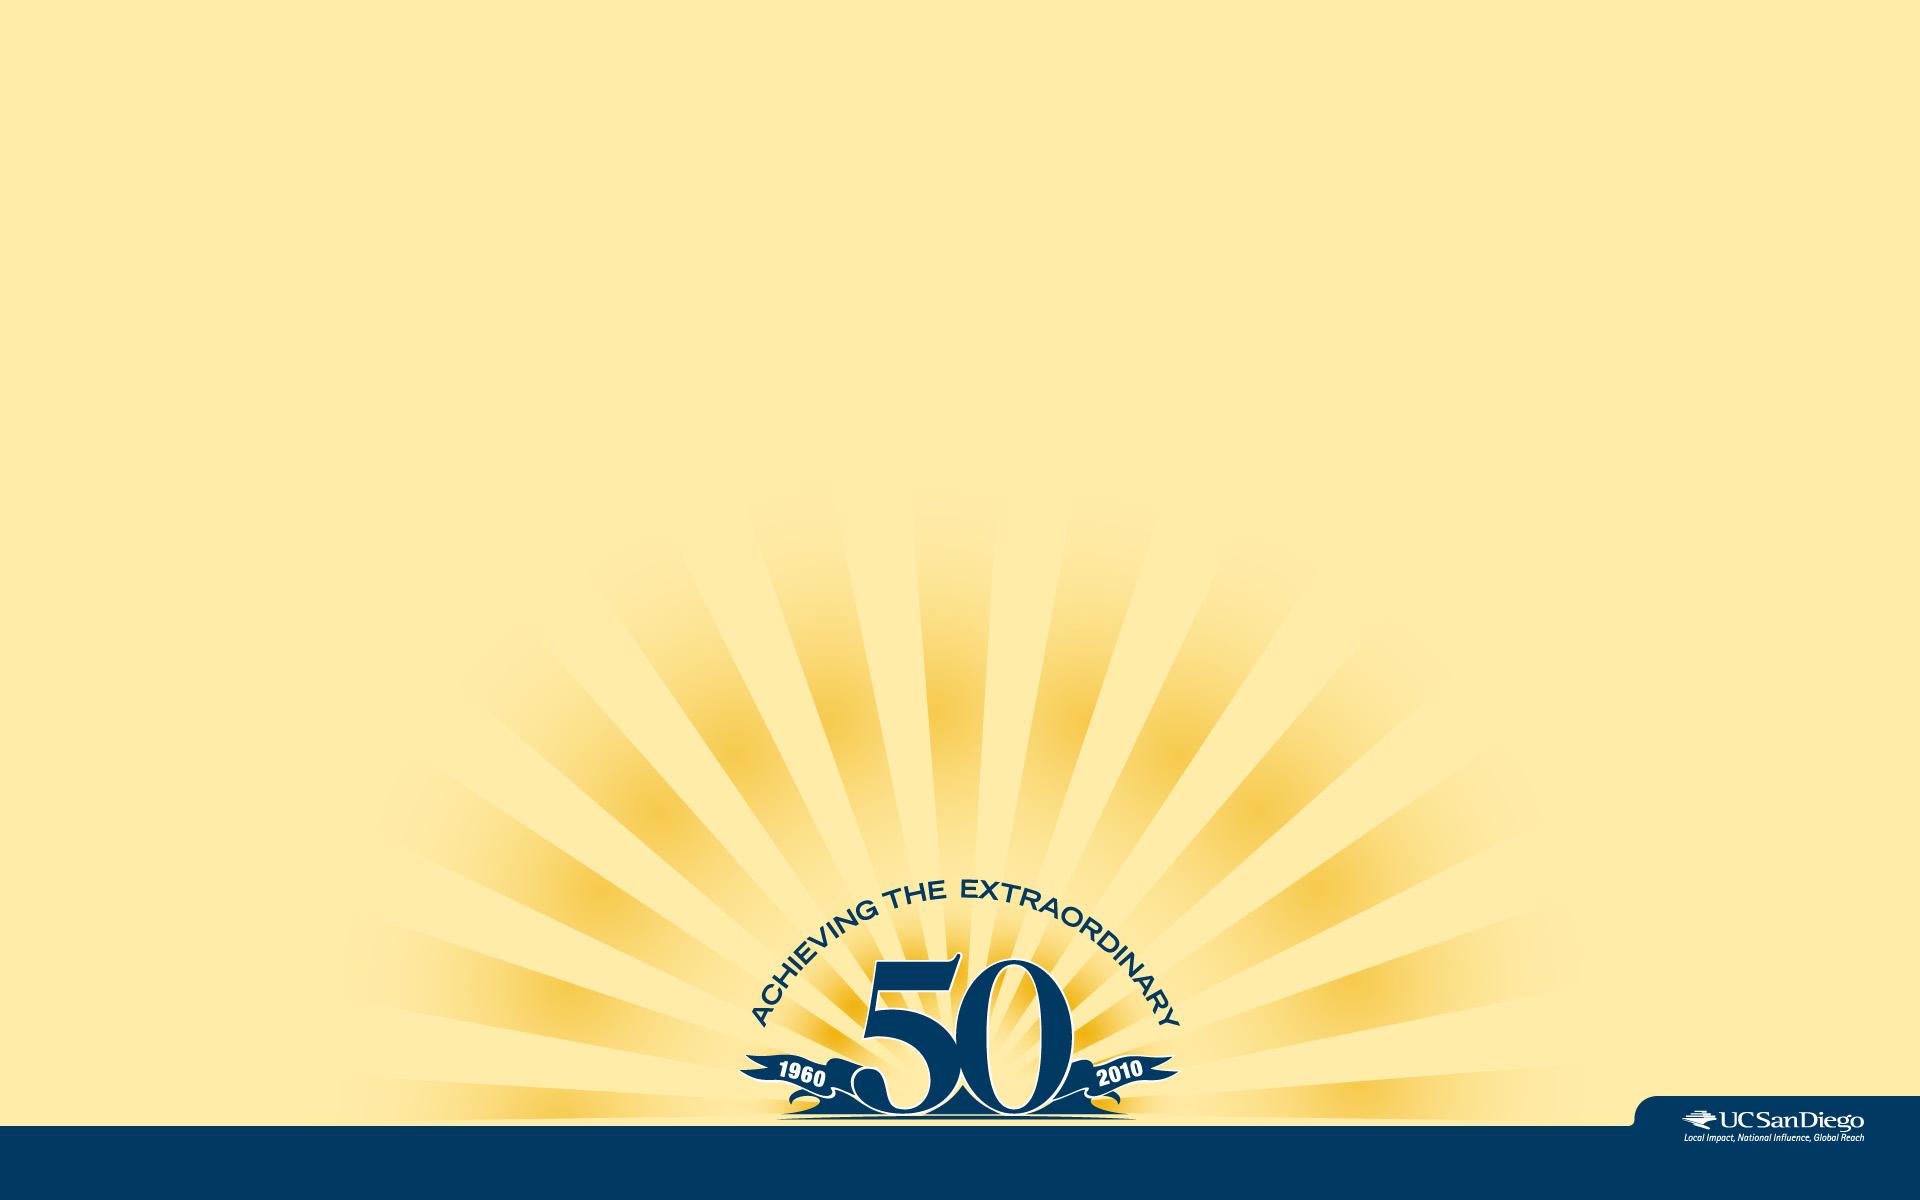 Aofoto 6x6ft Golden Happy 50th Birthday Background - Gold Happy 50th  Birthday - 1008x1008 Wallpaper - teahub.io